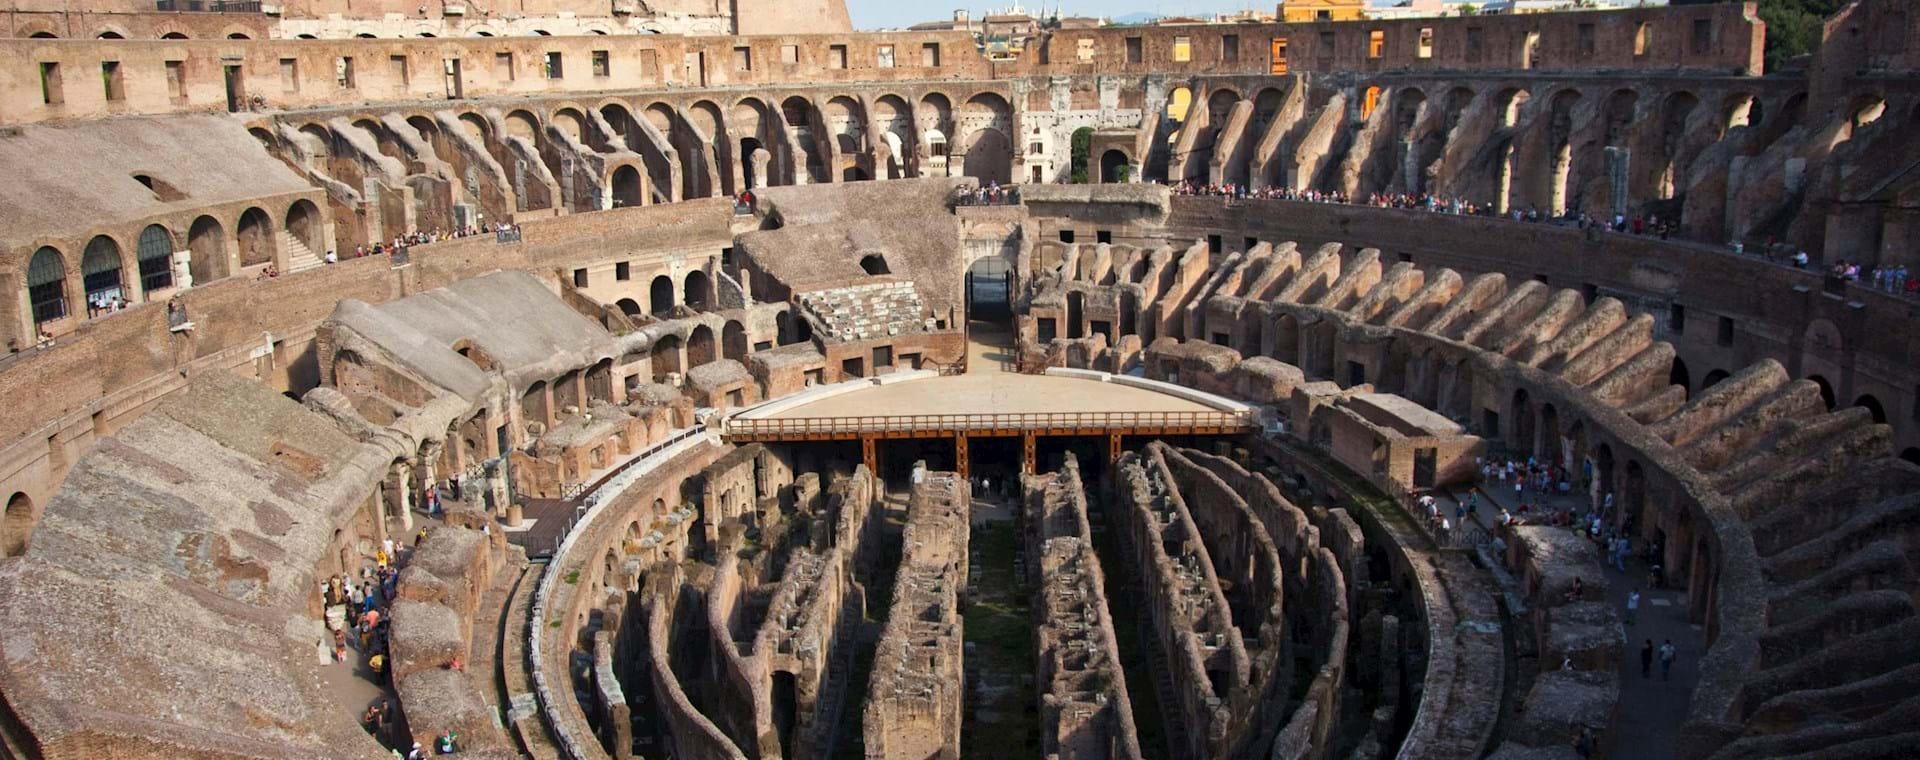 Kolosseum-Tour einschließlich Eintritt zum Kolosseum, Forum Romanum und Palatin